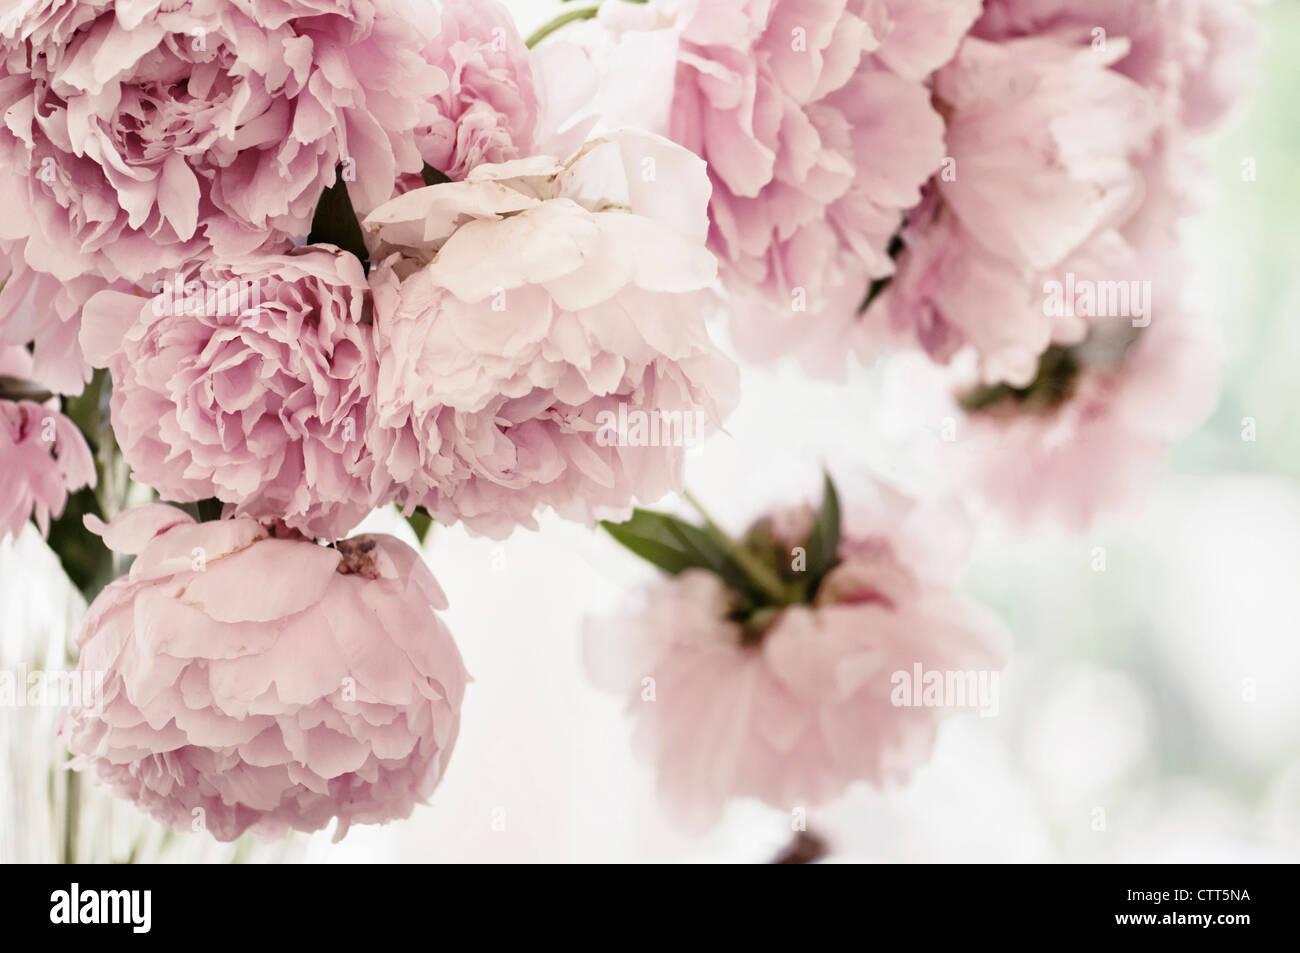 Paeonia Lactiflora Pfingstrose Rosa Blumen In Einer Vase